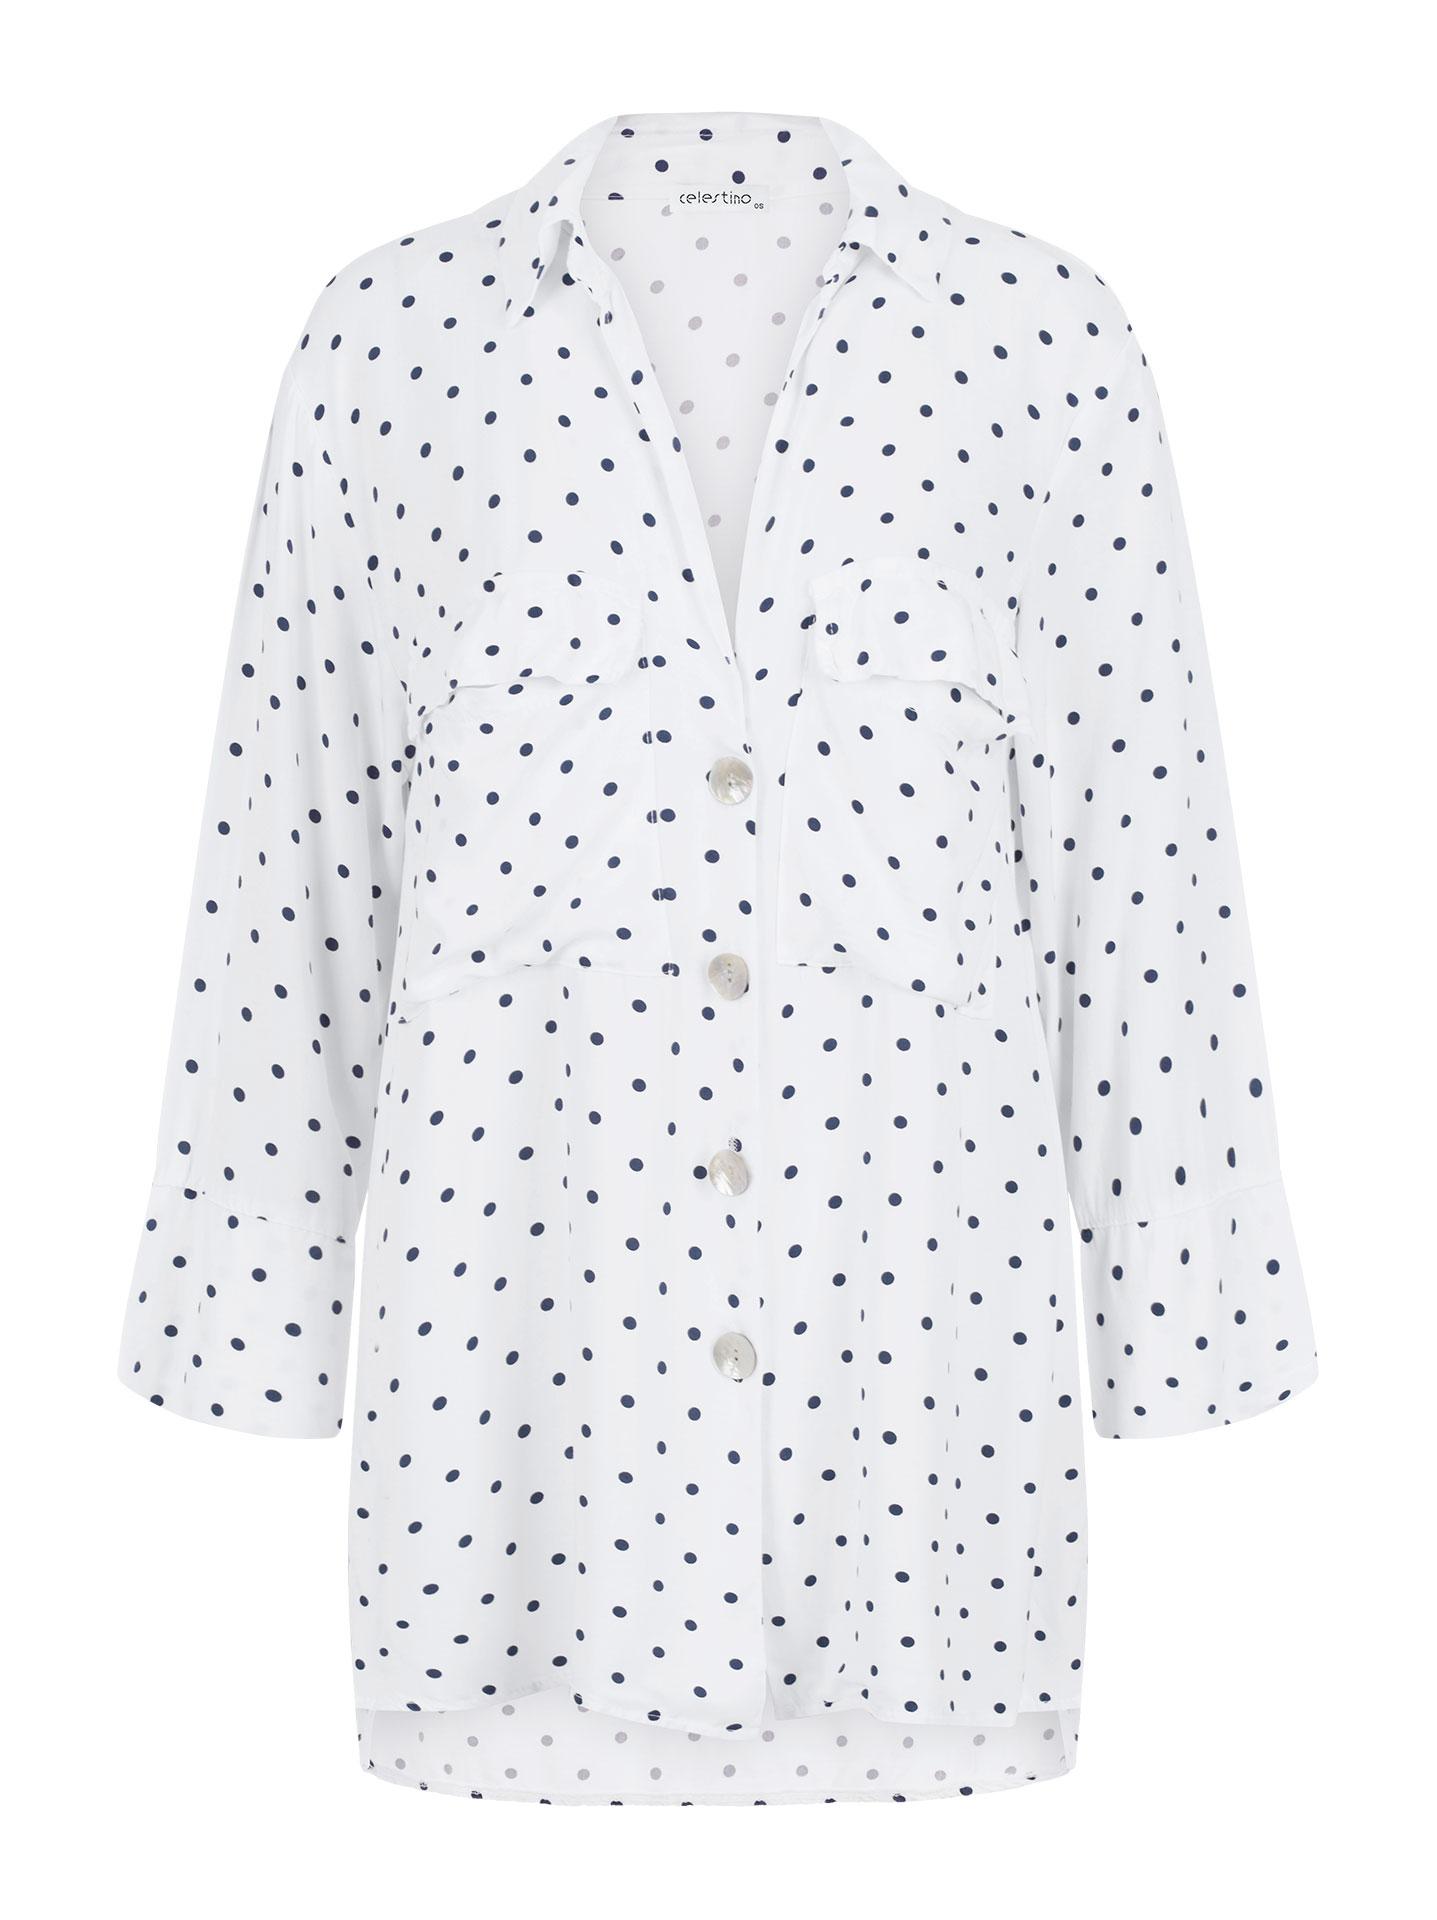 af88d3a7936 Πουά πουκάμισο με τσέπες σε λευκο, 11,95€   Celestino